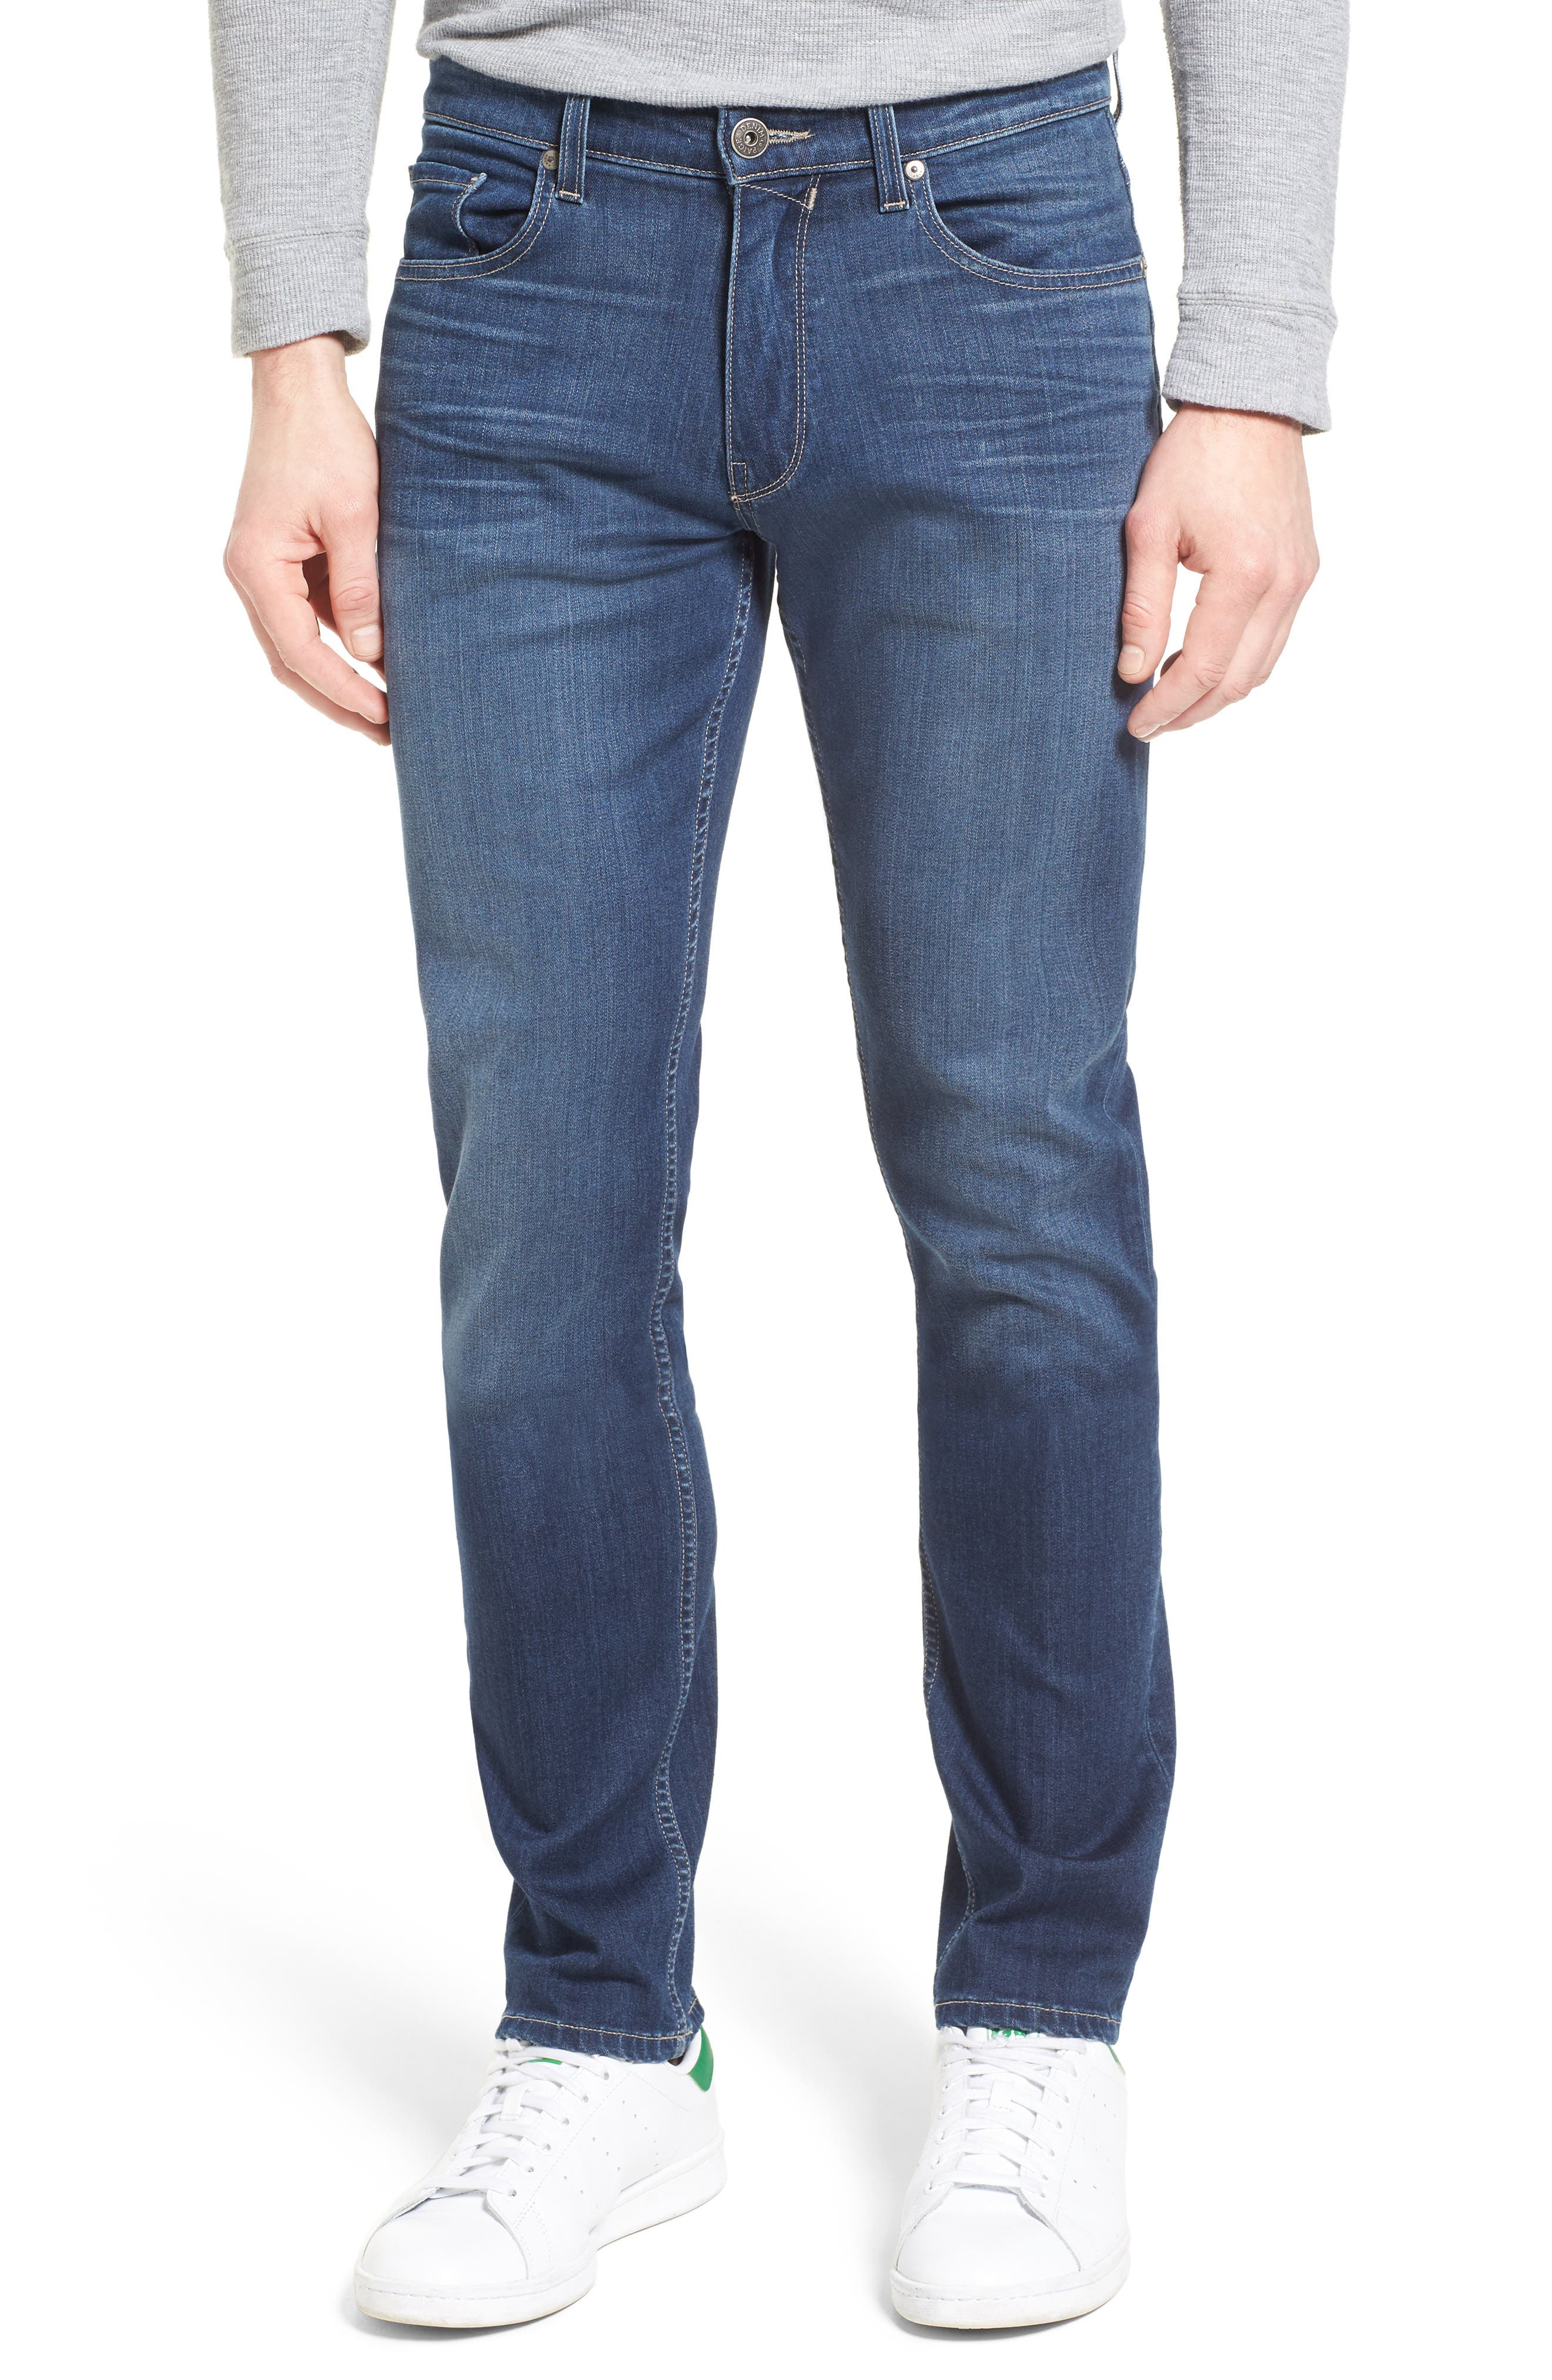 PAIGE Transcend - Lennox Straight Leg Jeans (Leo)